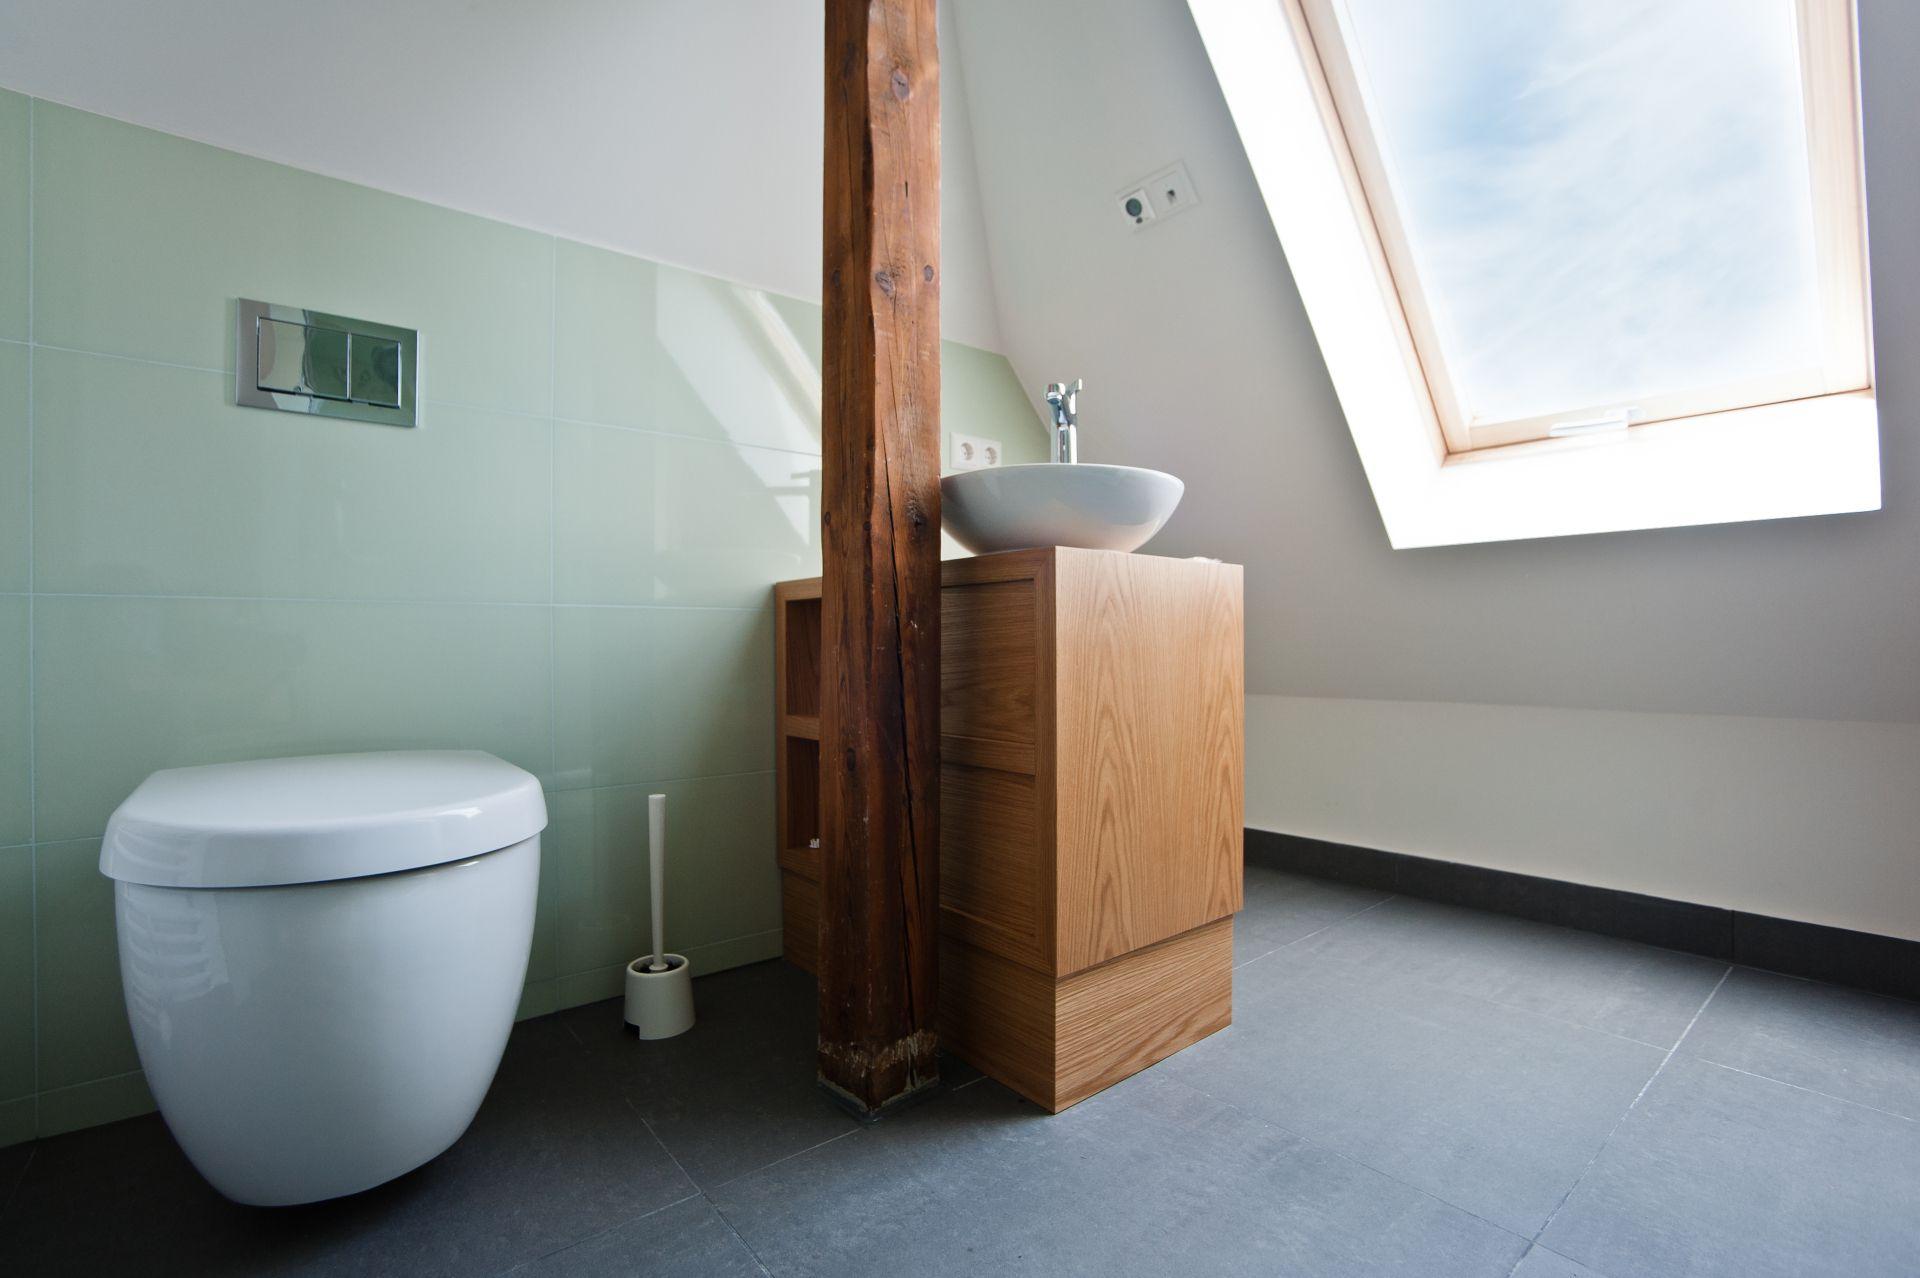 K nstlercharme unterm dach for Badezimmer ideen unterm dach